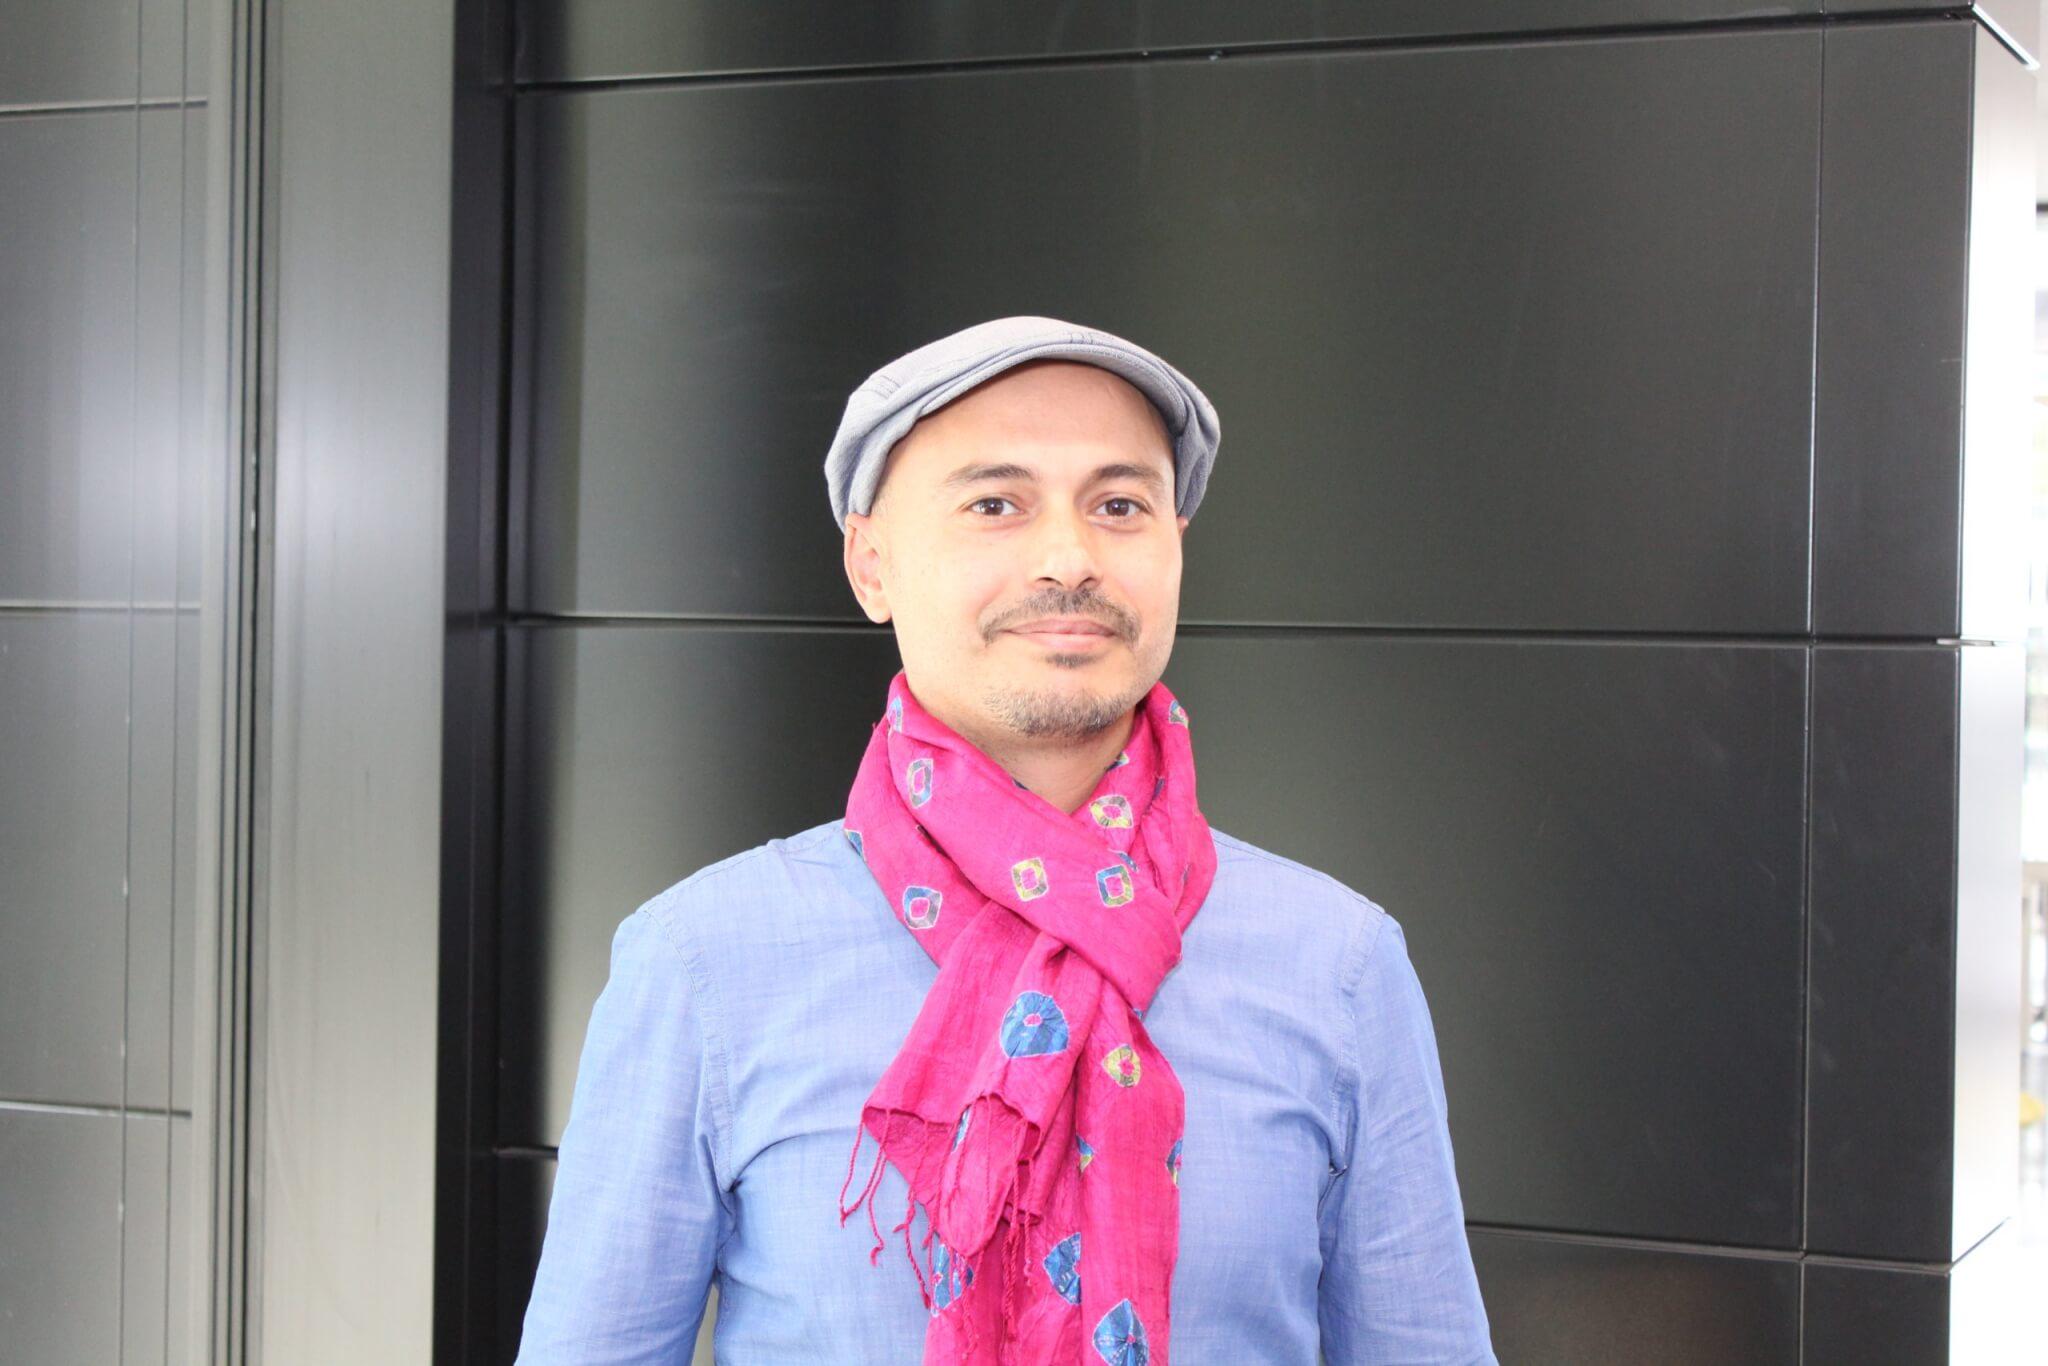 Karim Chabrak of coinsense.org